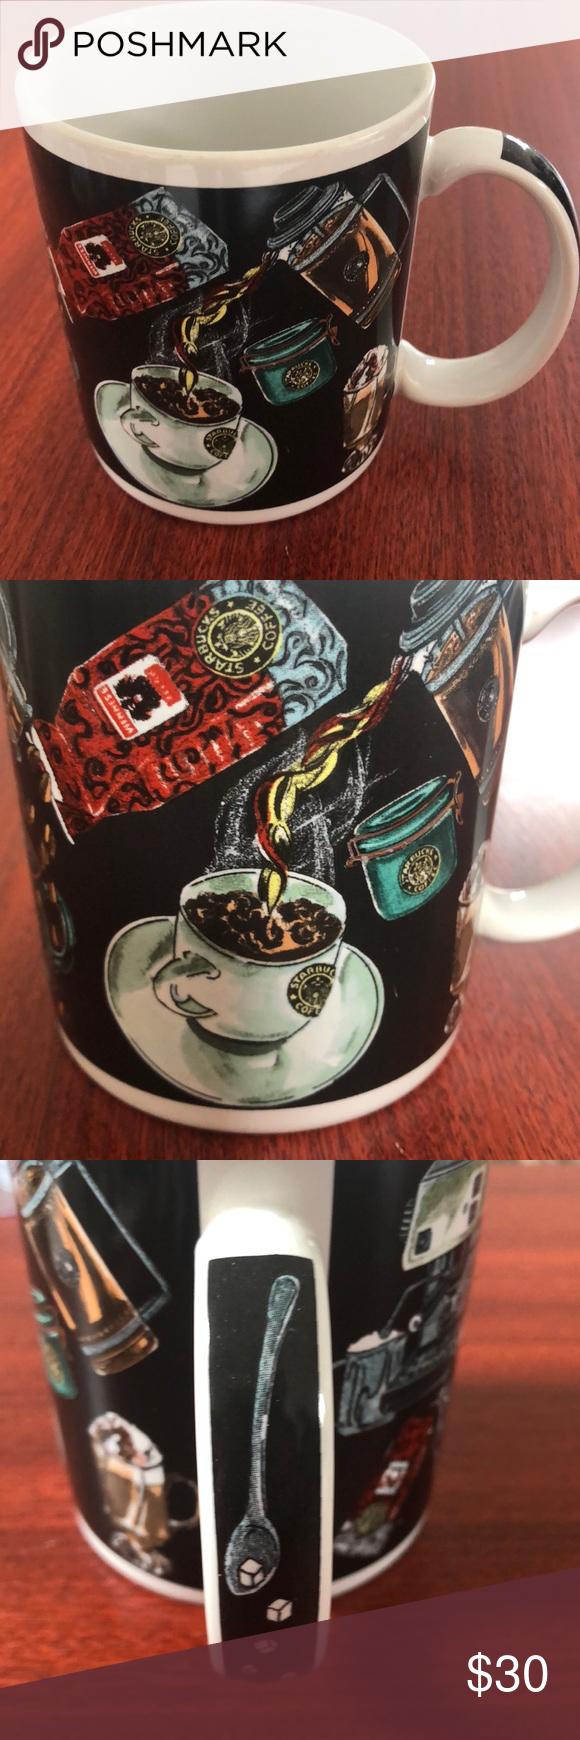 V t g Starbucks mug Starbucks mugs, Starbucks, Mugs